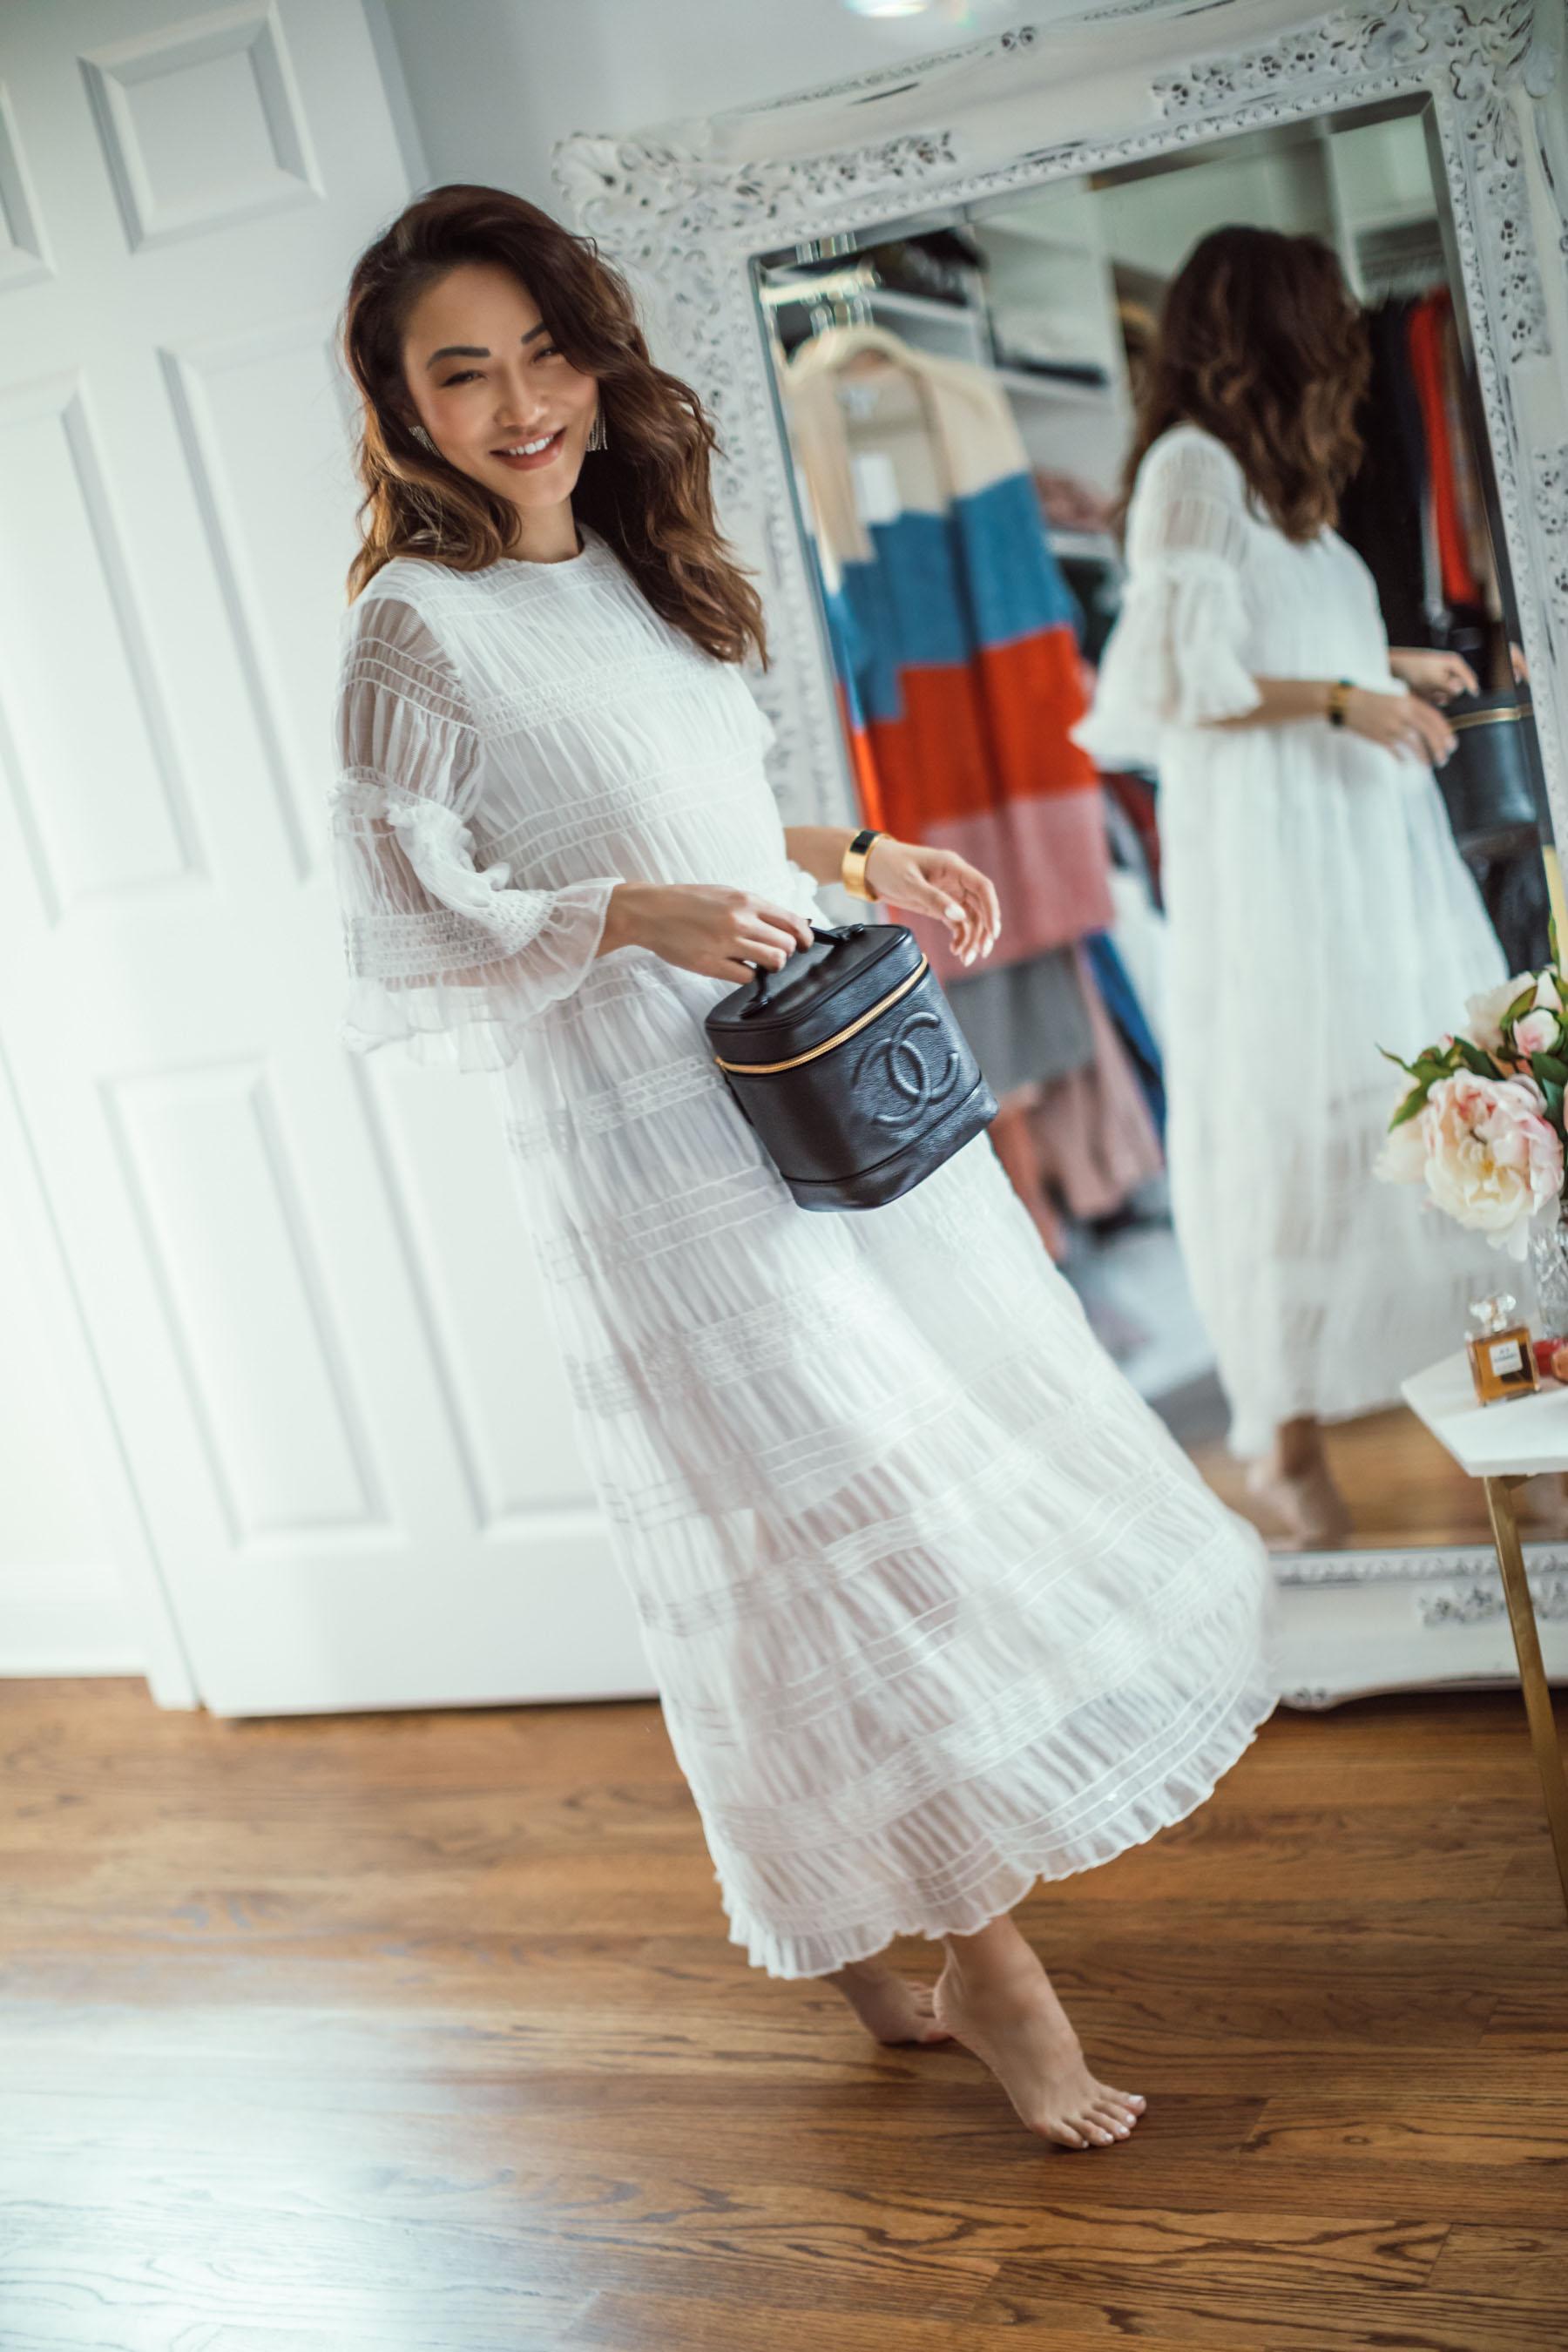 How to Organize Your Closet, Chanel Vanity Bag, White Maxi Dress // Notjessfashion.com